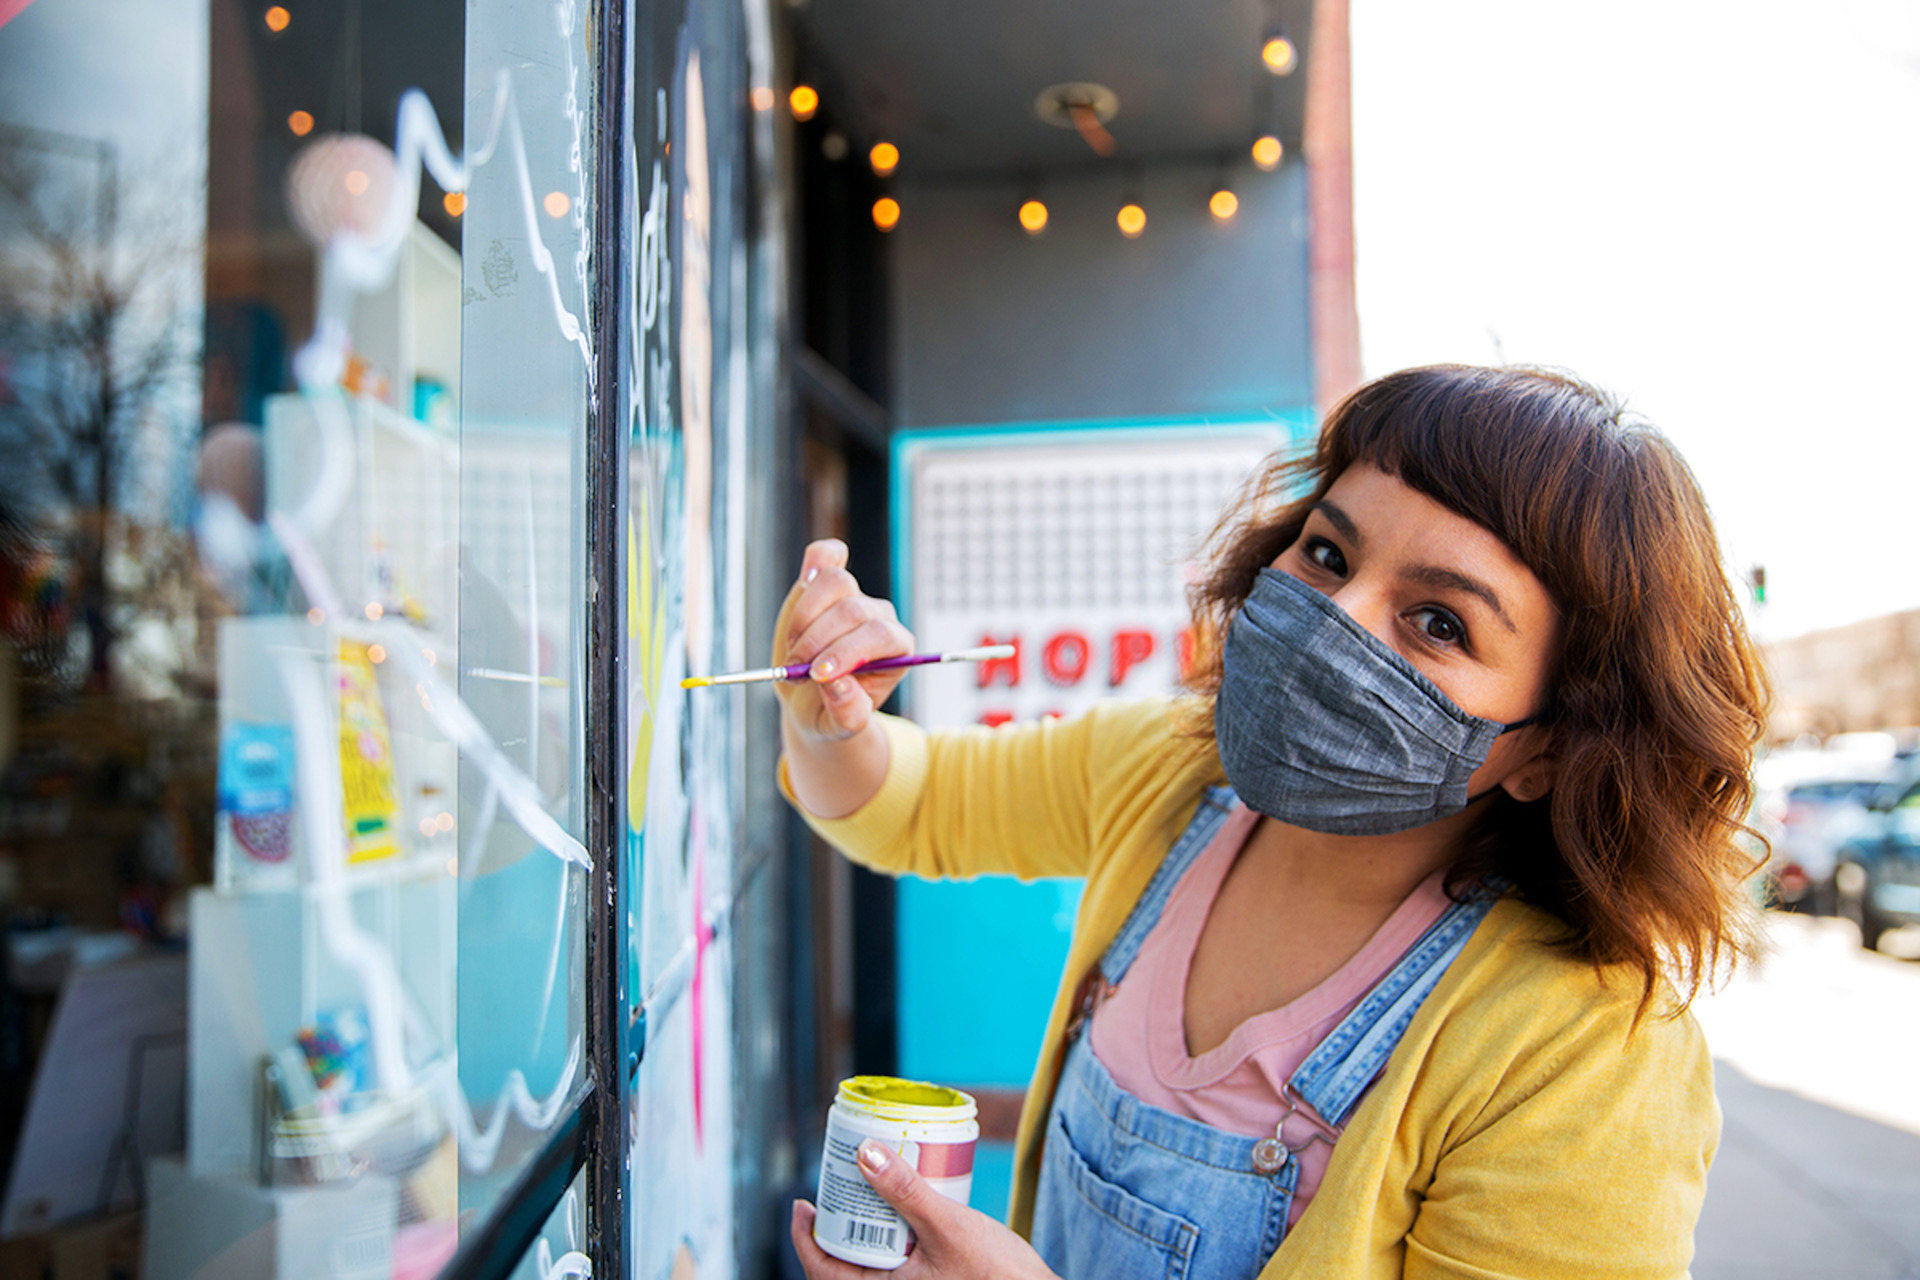 Hope Tank kicks off year of window murals with piece by artist Cindy Loya